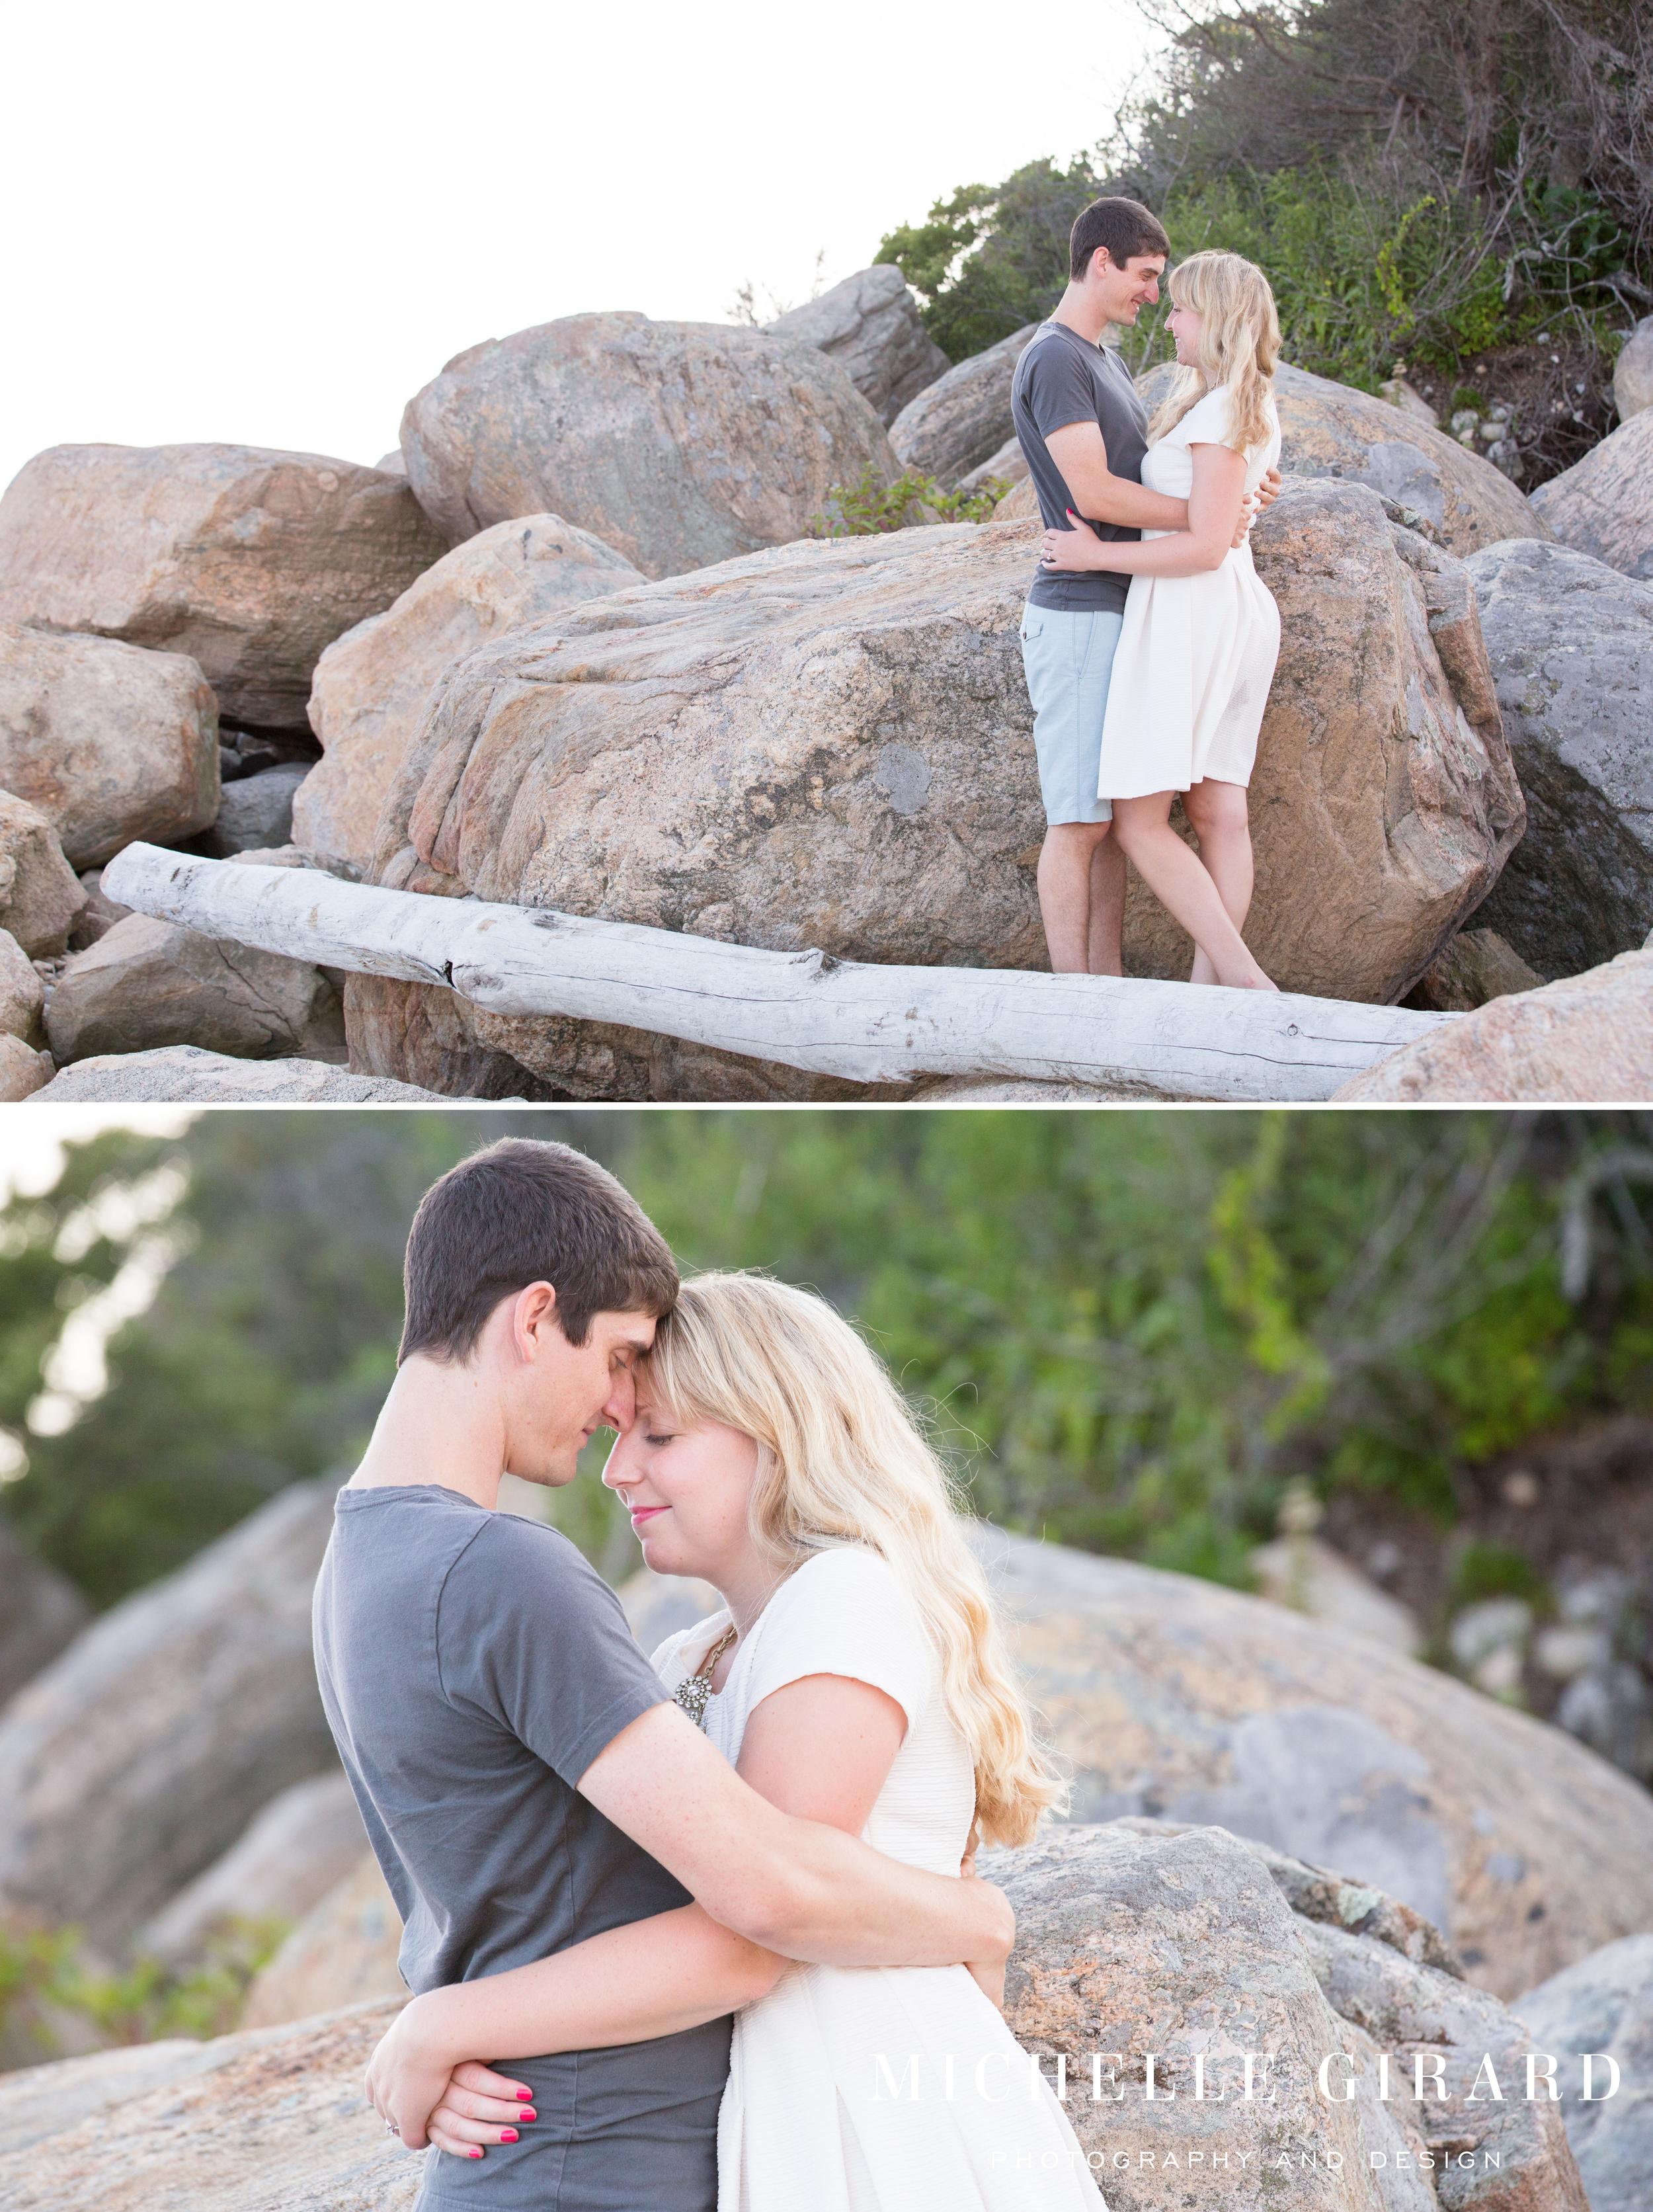 HammonassetBeach_ EngagementSession_MadisonCT_MichelleGirardPhotography02.jpg